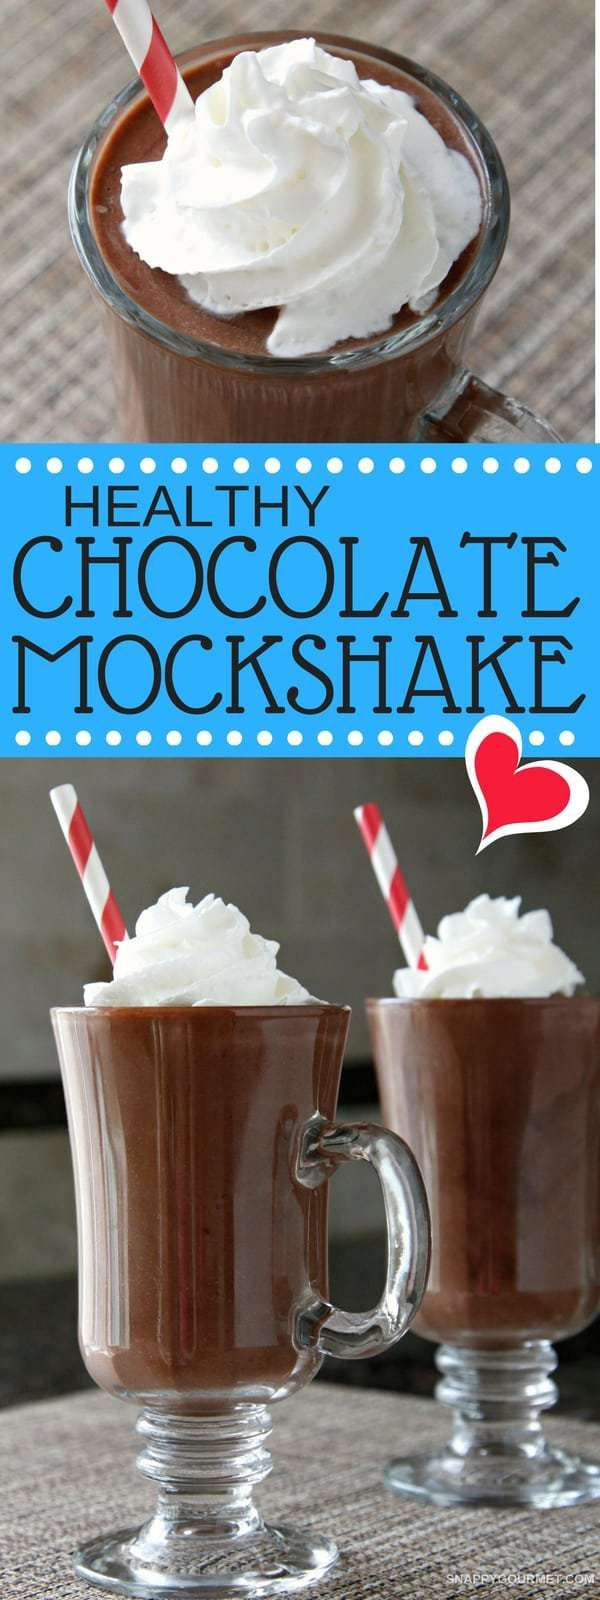 Healthy Chocolate Mockshake - easy chocolate milkshake recipe without milk or ice cream! SnappyGourmet.com